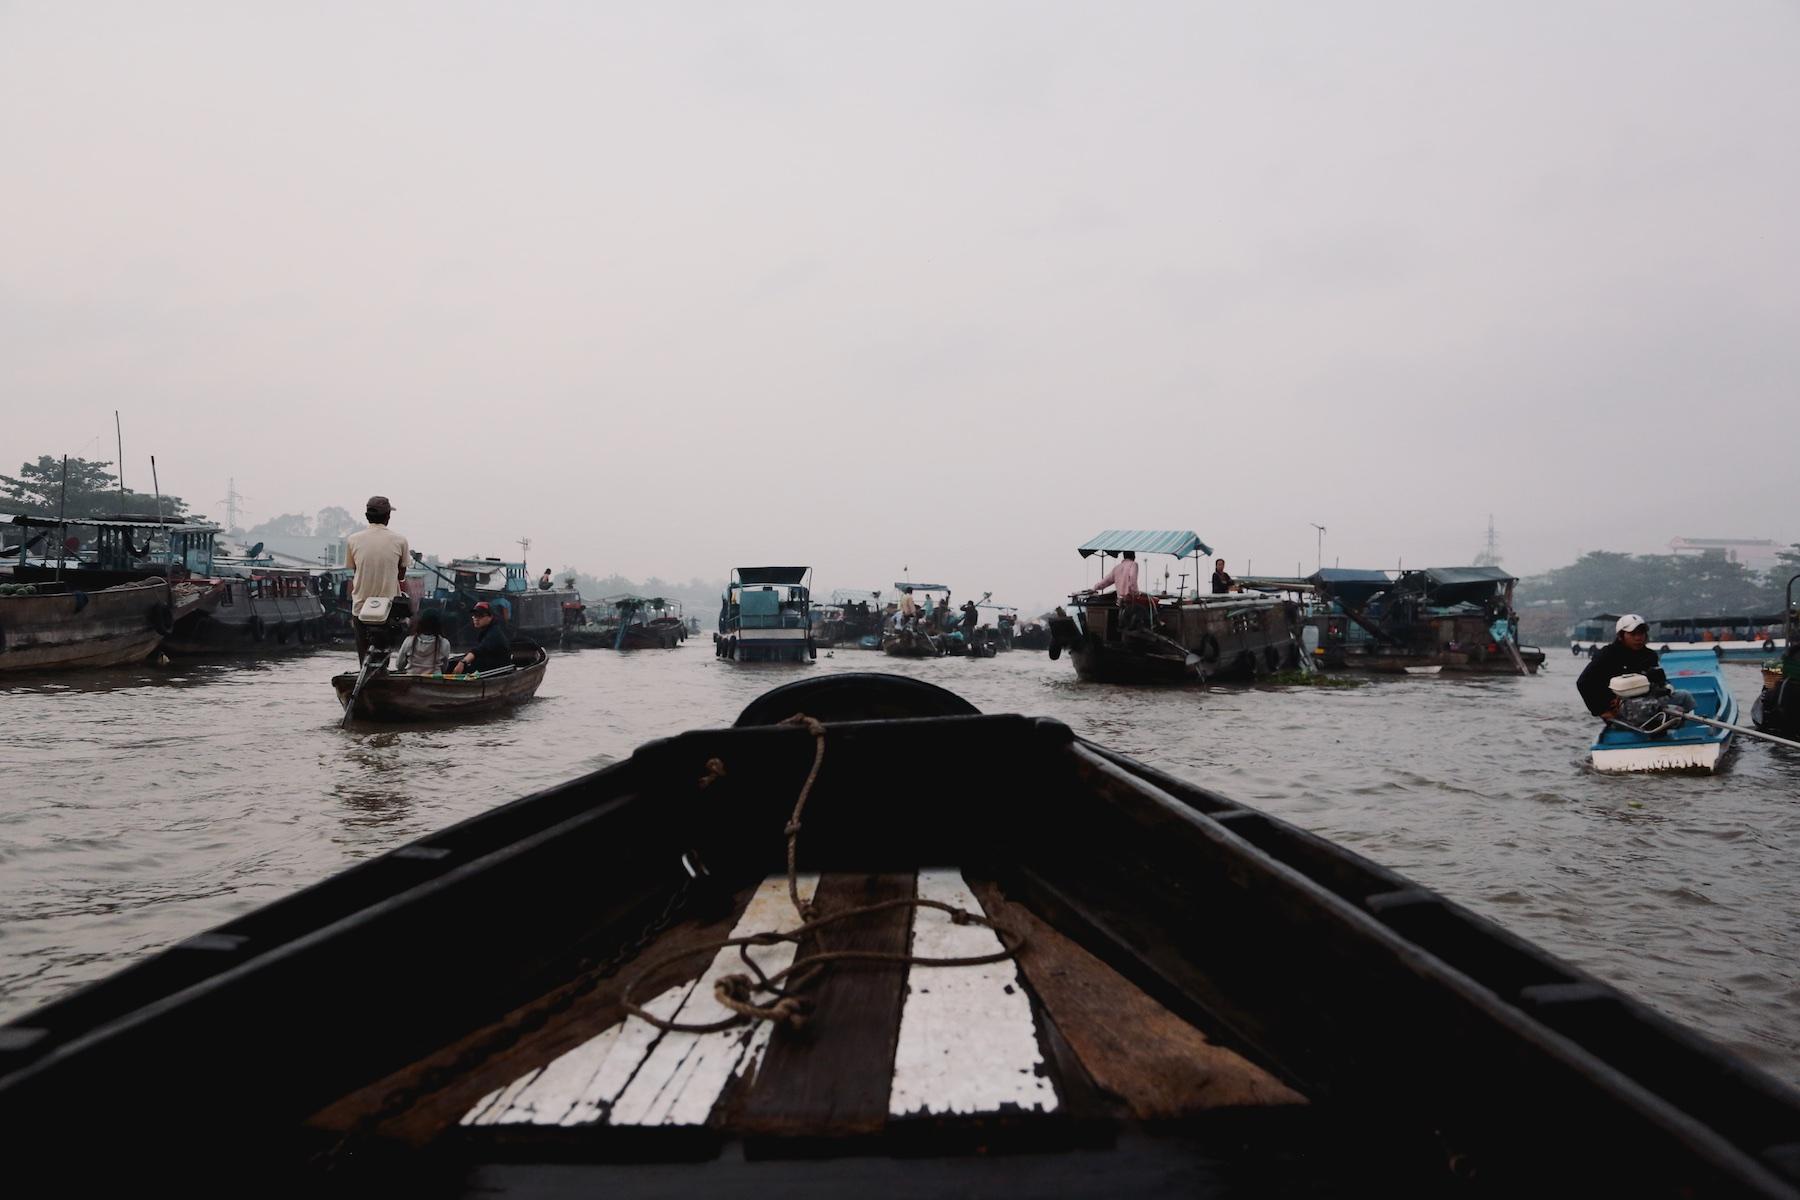 MEKONG DELTA VIETNAM © Manoah Biesheuvel 12